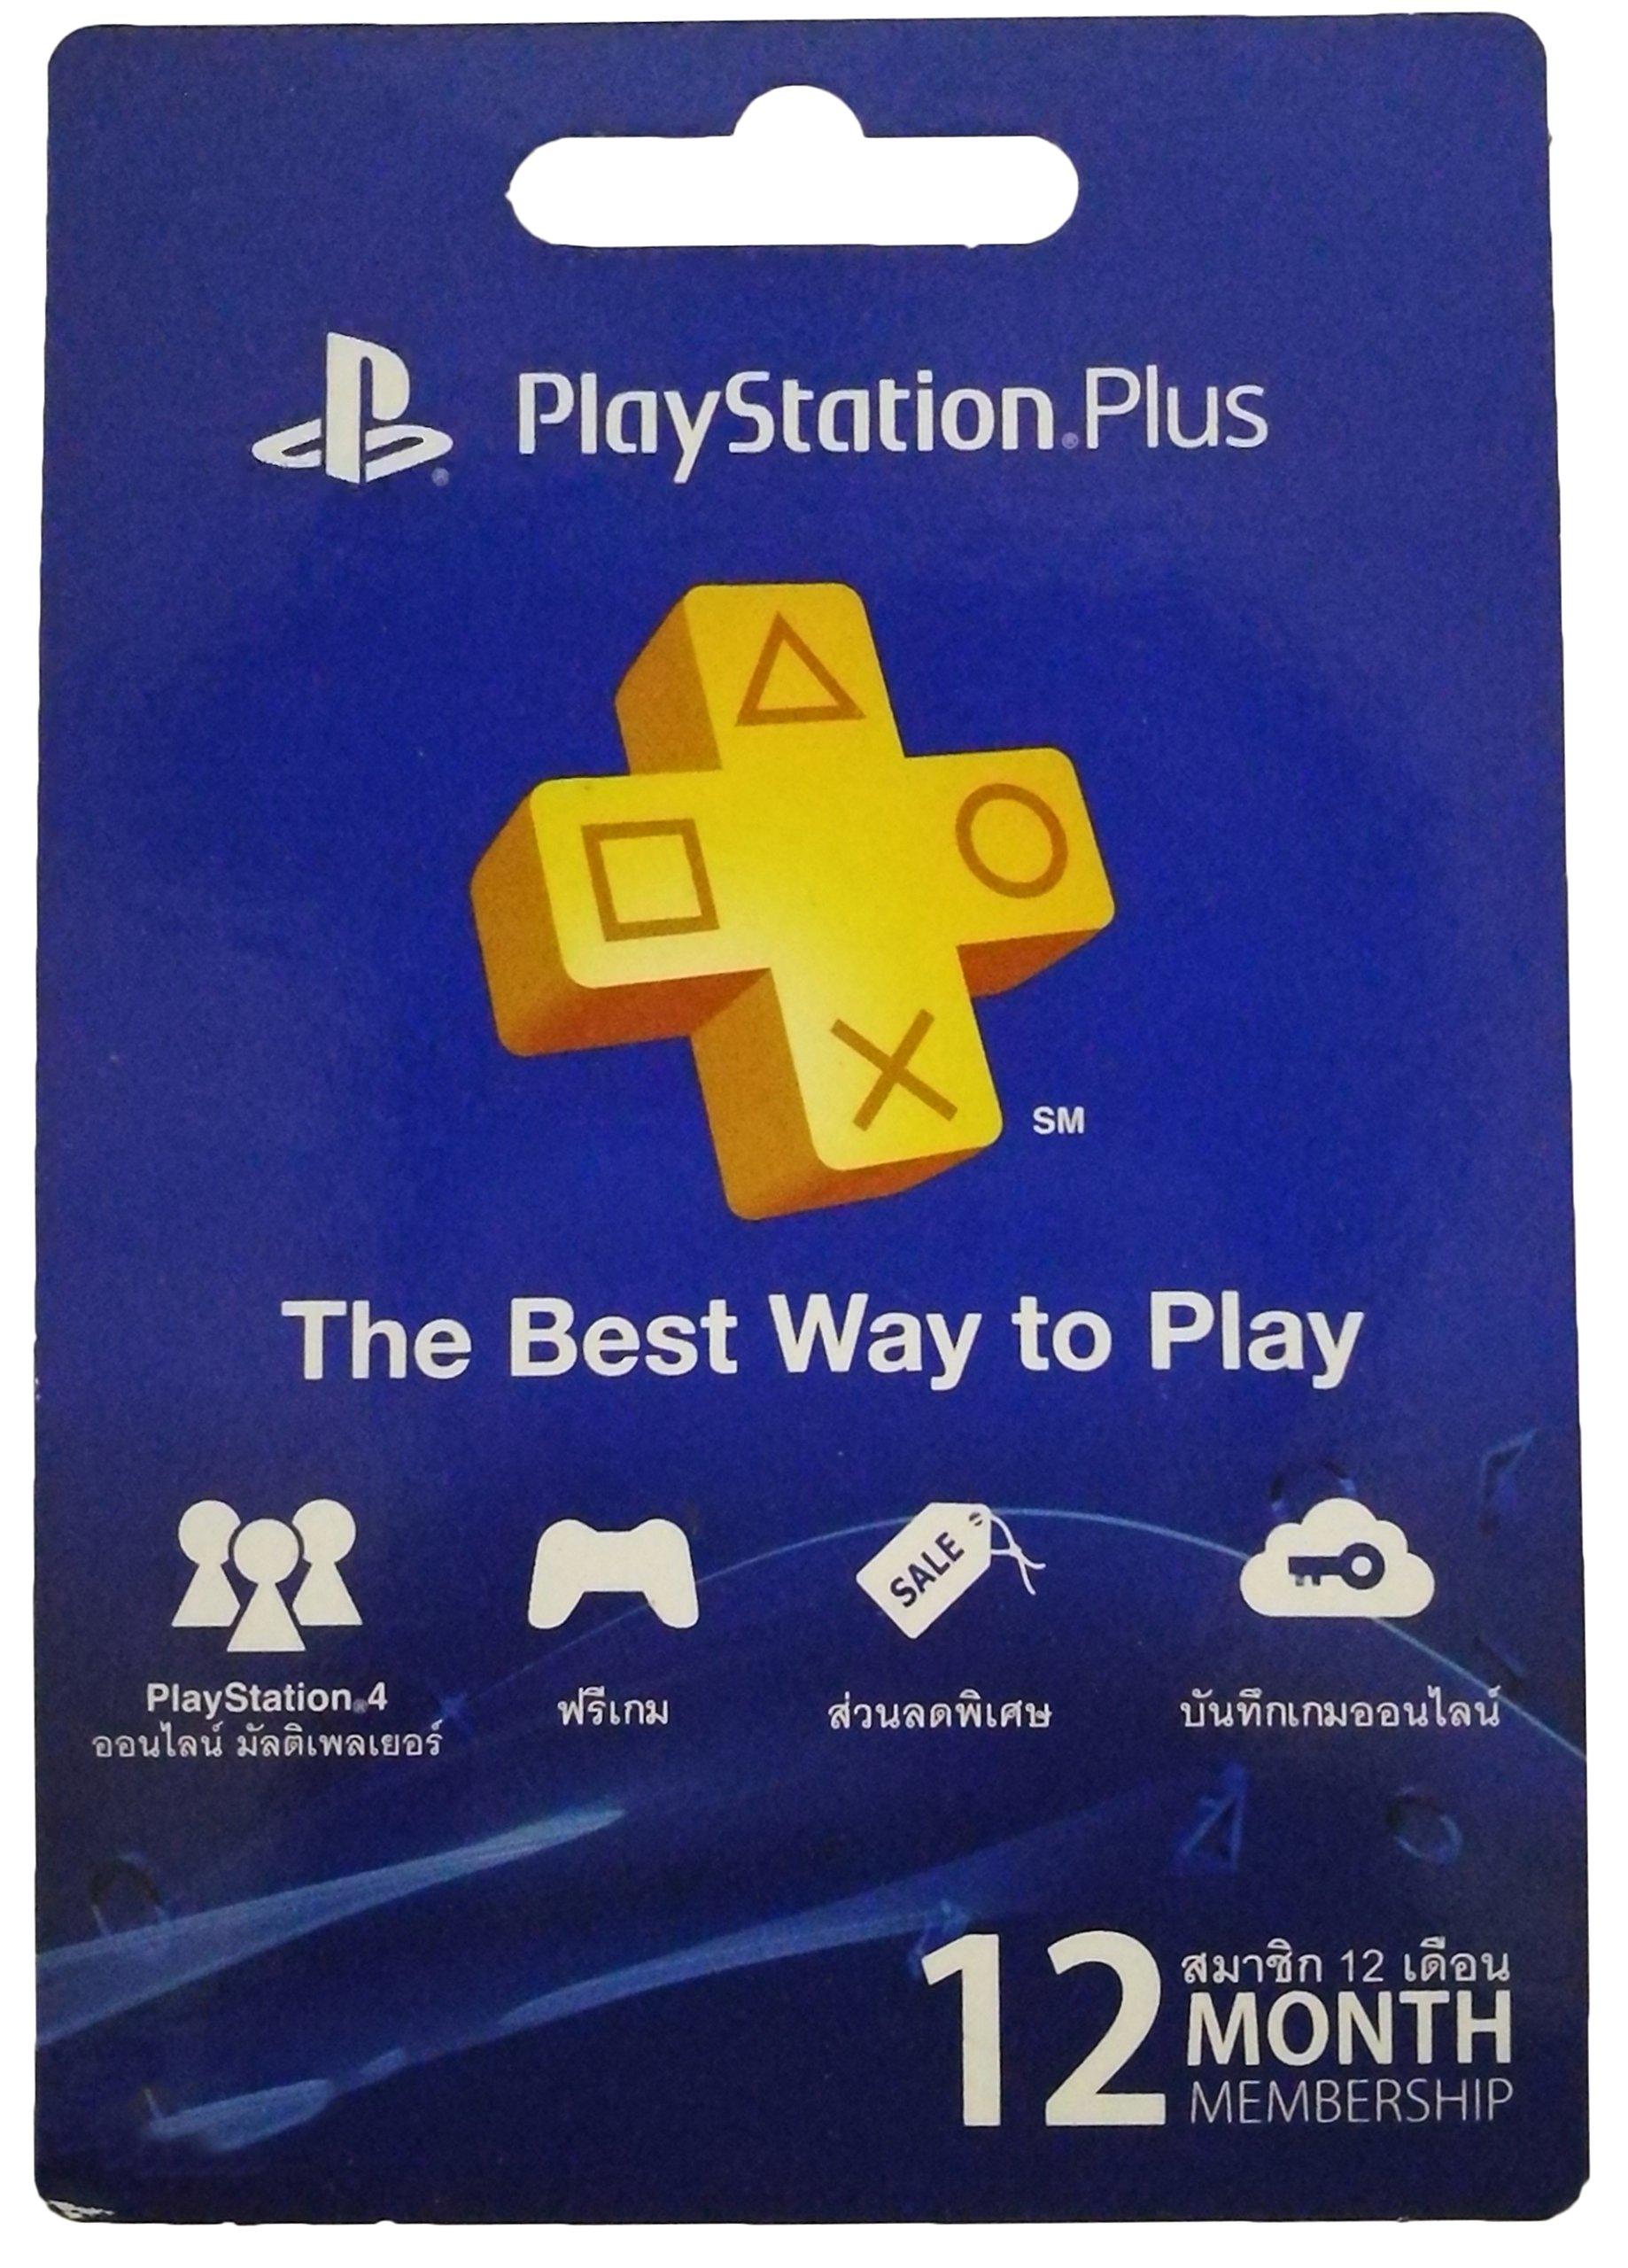 12 Month PlayStation Plus Membership Zone 3